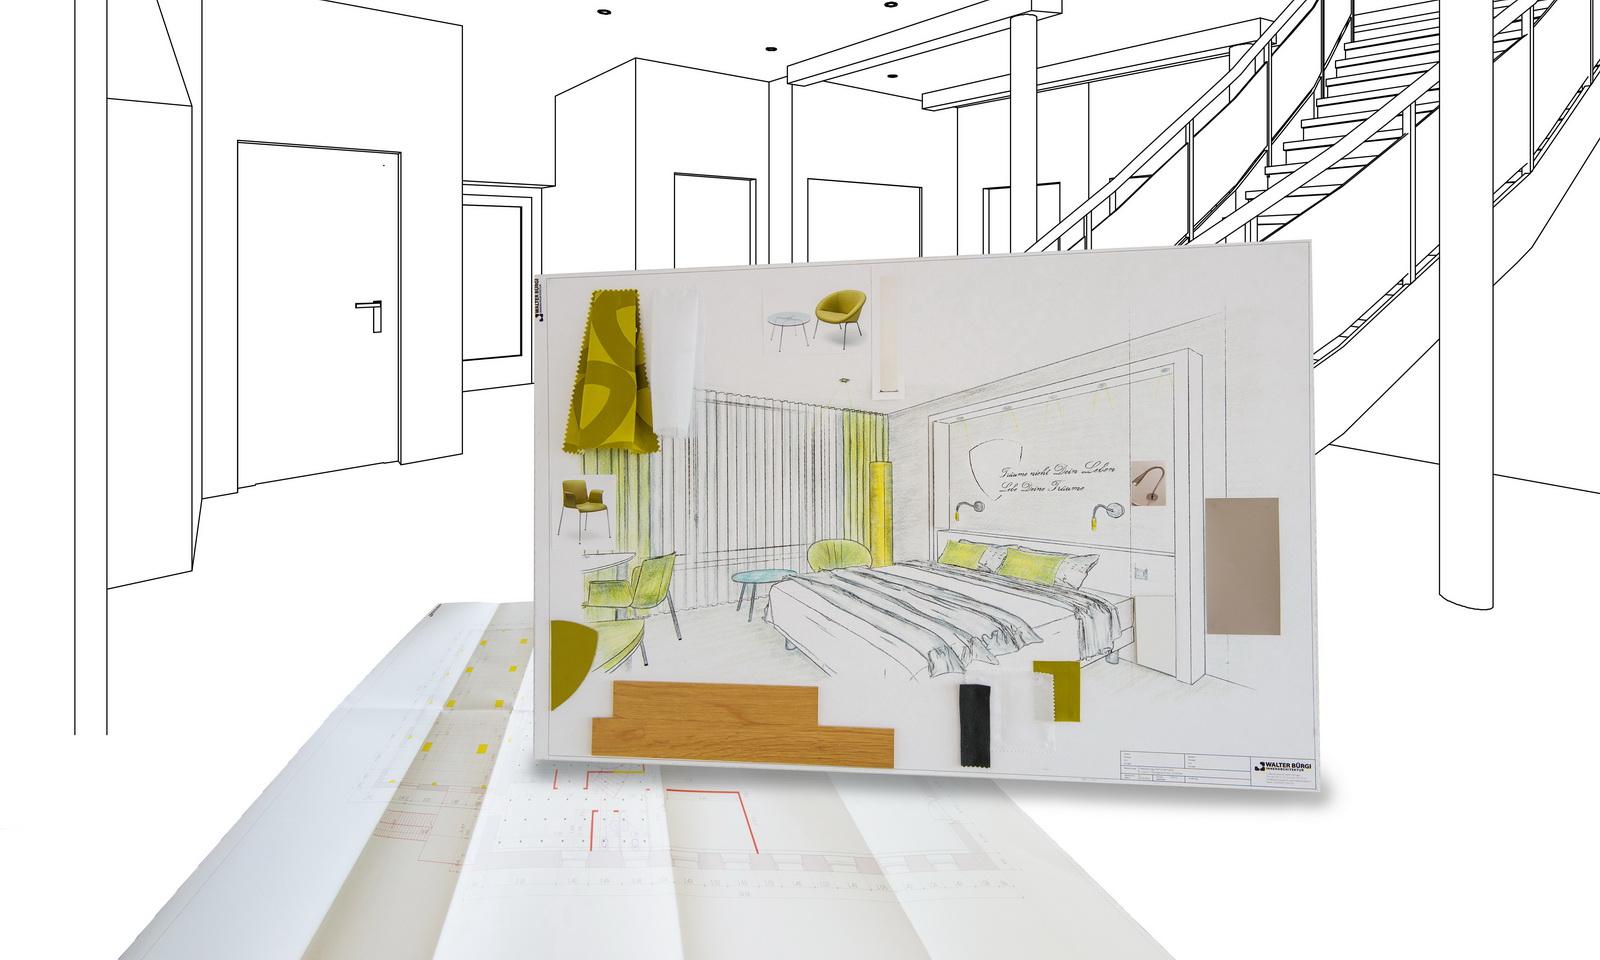 b rgi innenarchitektur oftringen unser atelier walter